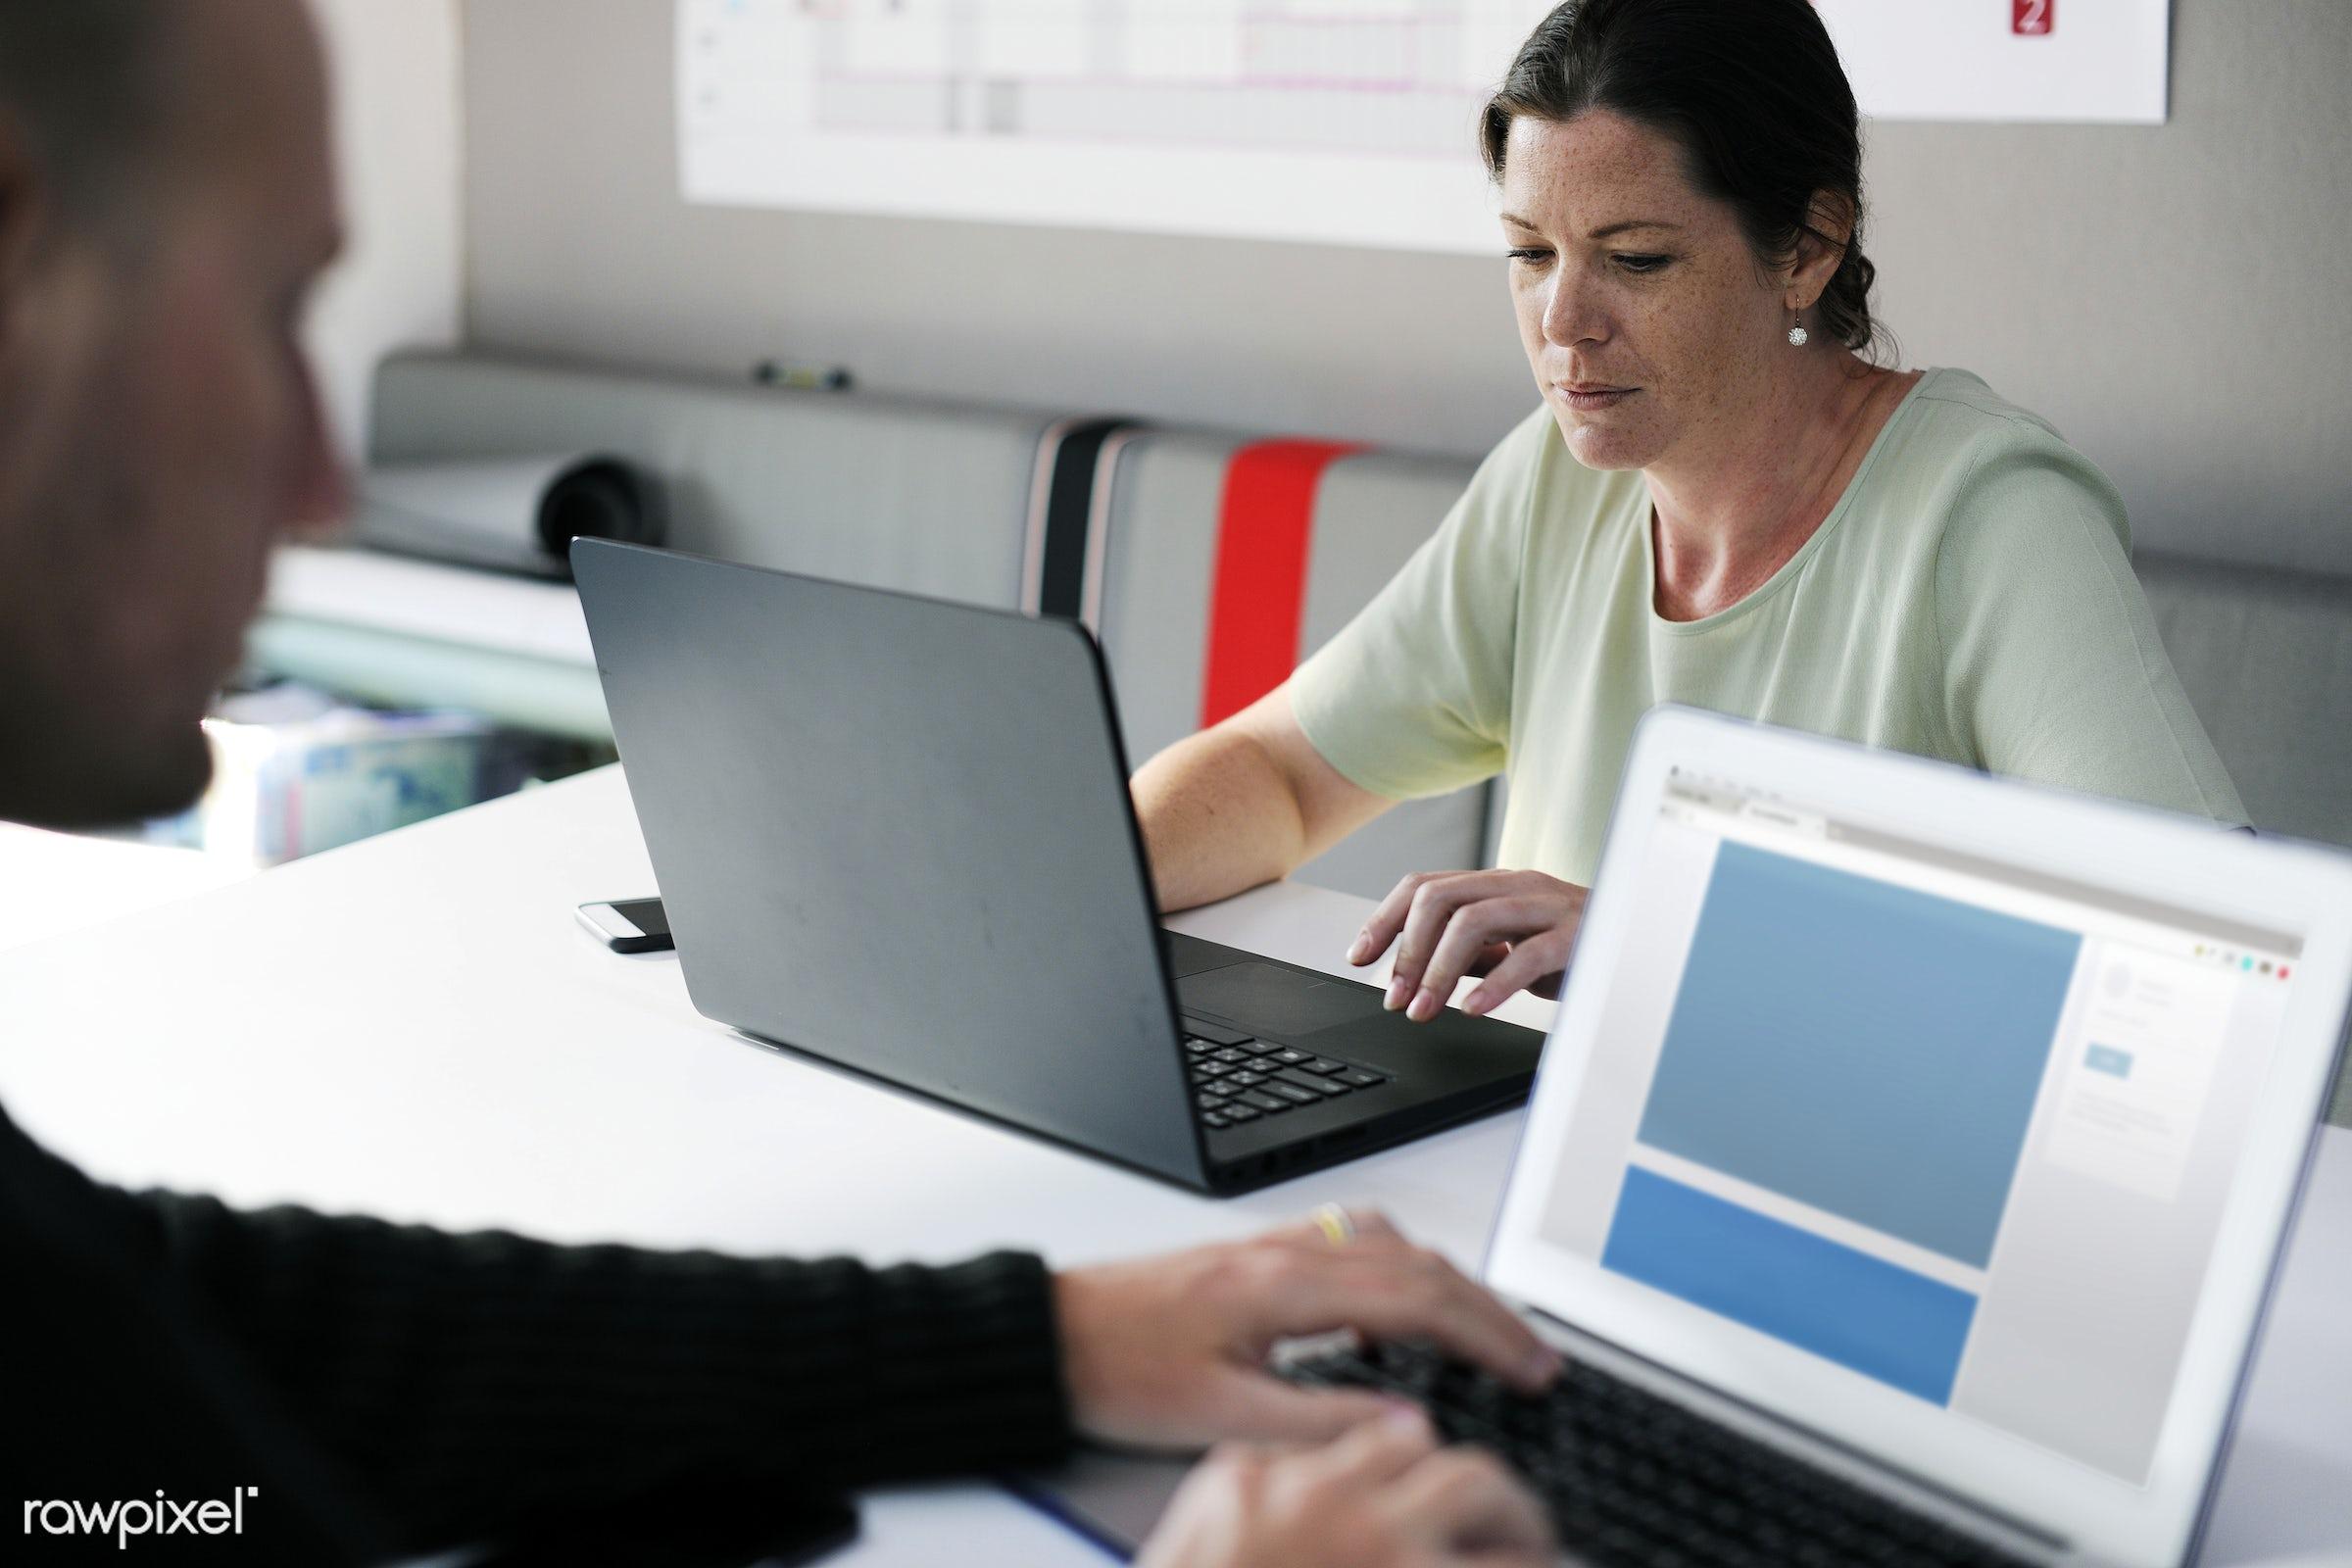 People using computer laptop - brainstorm, casual, caucasian, cc0, colleagues, communication, creative, creative common 0,...